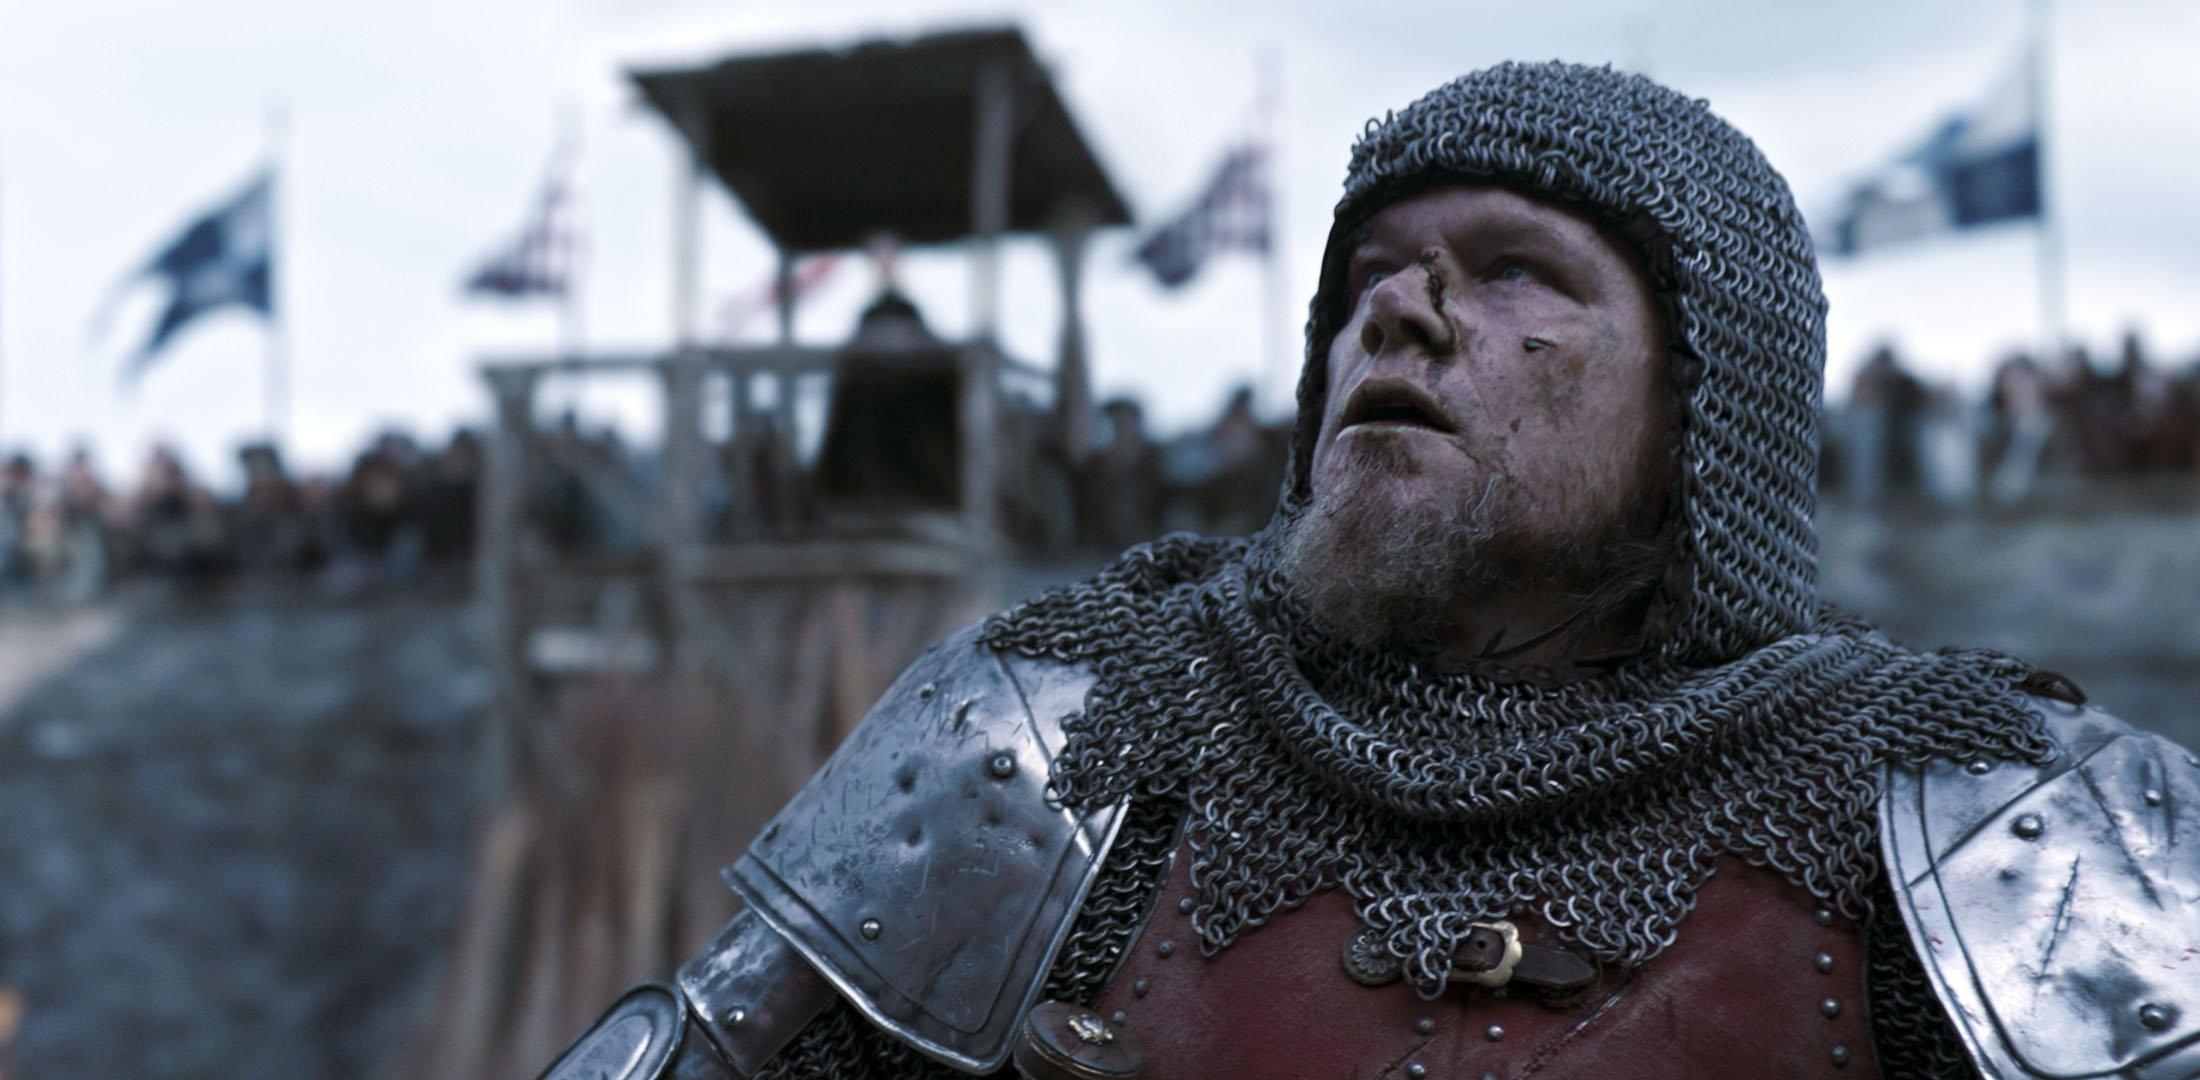 Matt Damon as Jean de Carrouges, in a scene from the film 'The Last Duel.'  (20th Century Studios via AP)